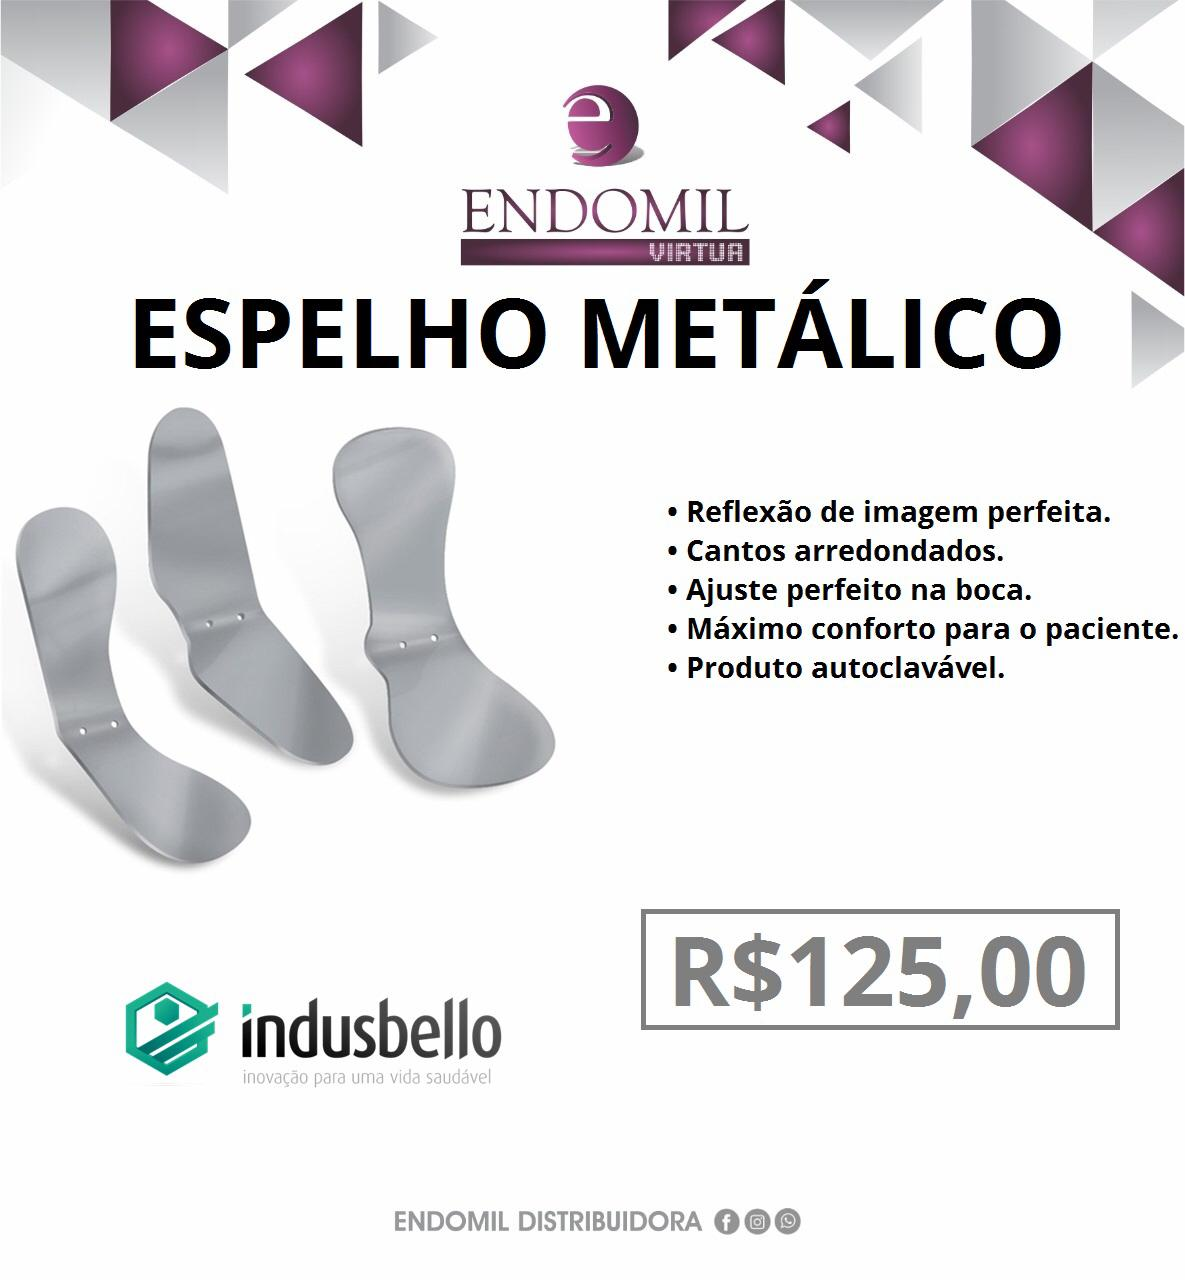 ESPELHO METÁLICO - INDUSBELLO